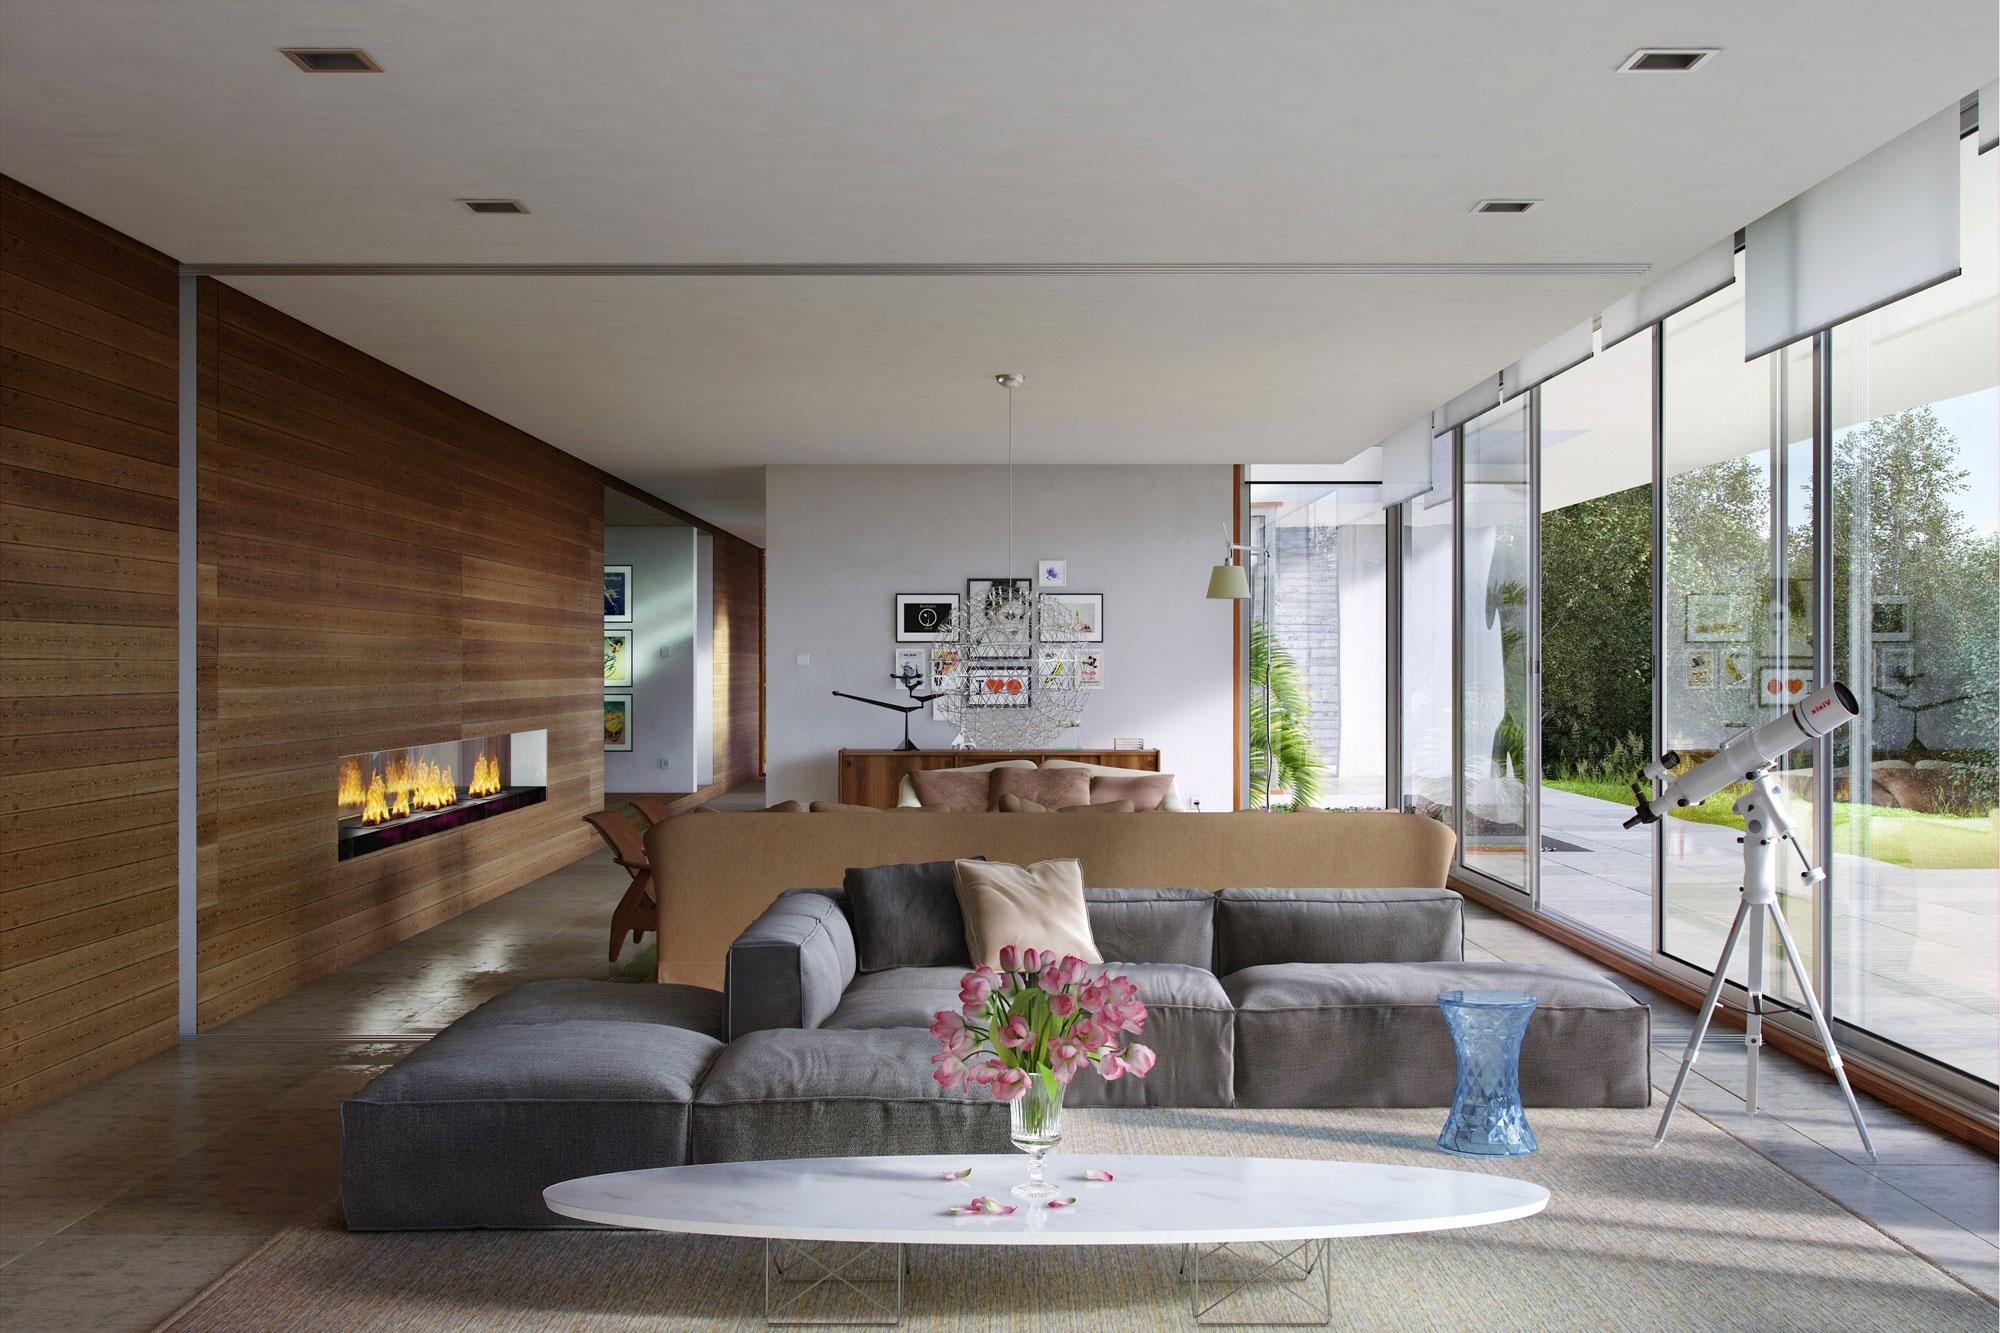 Minimalism: 34 Great Living Room Designs - Decoholic on Minimalist Living Room Design  id=48286